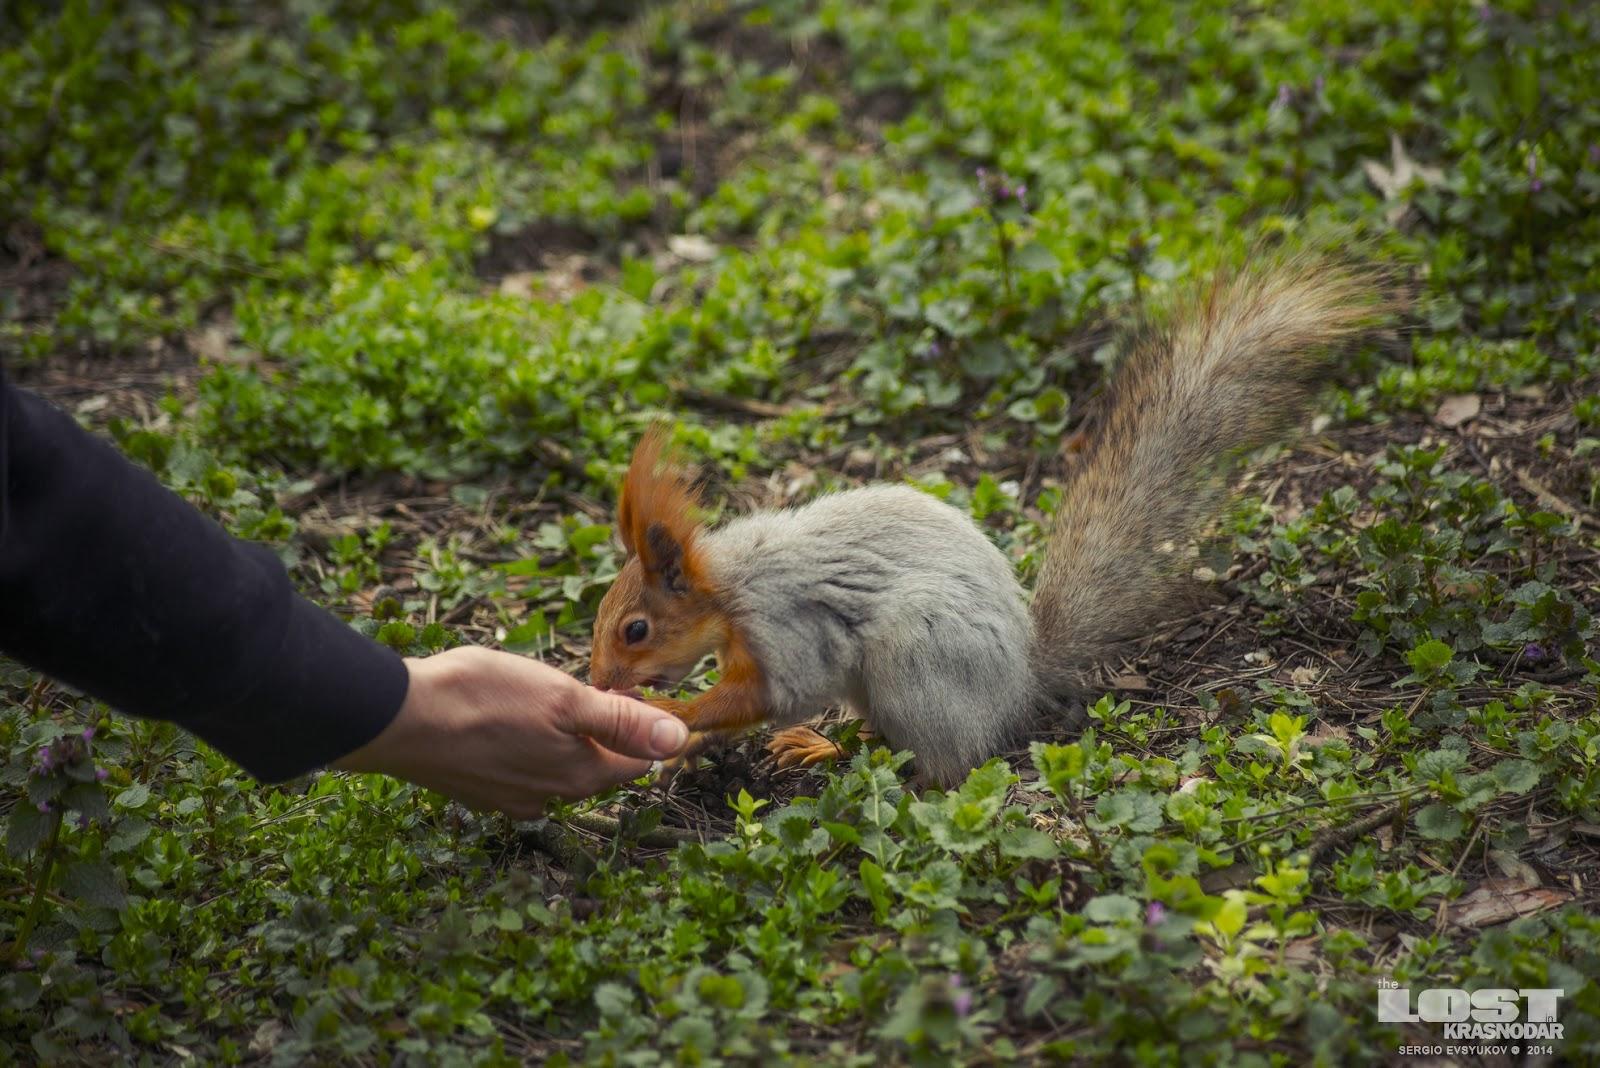 Squirrels in park